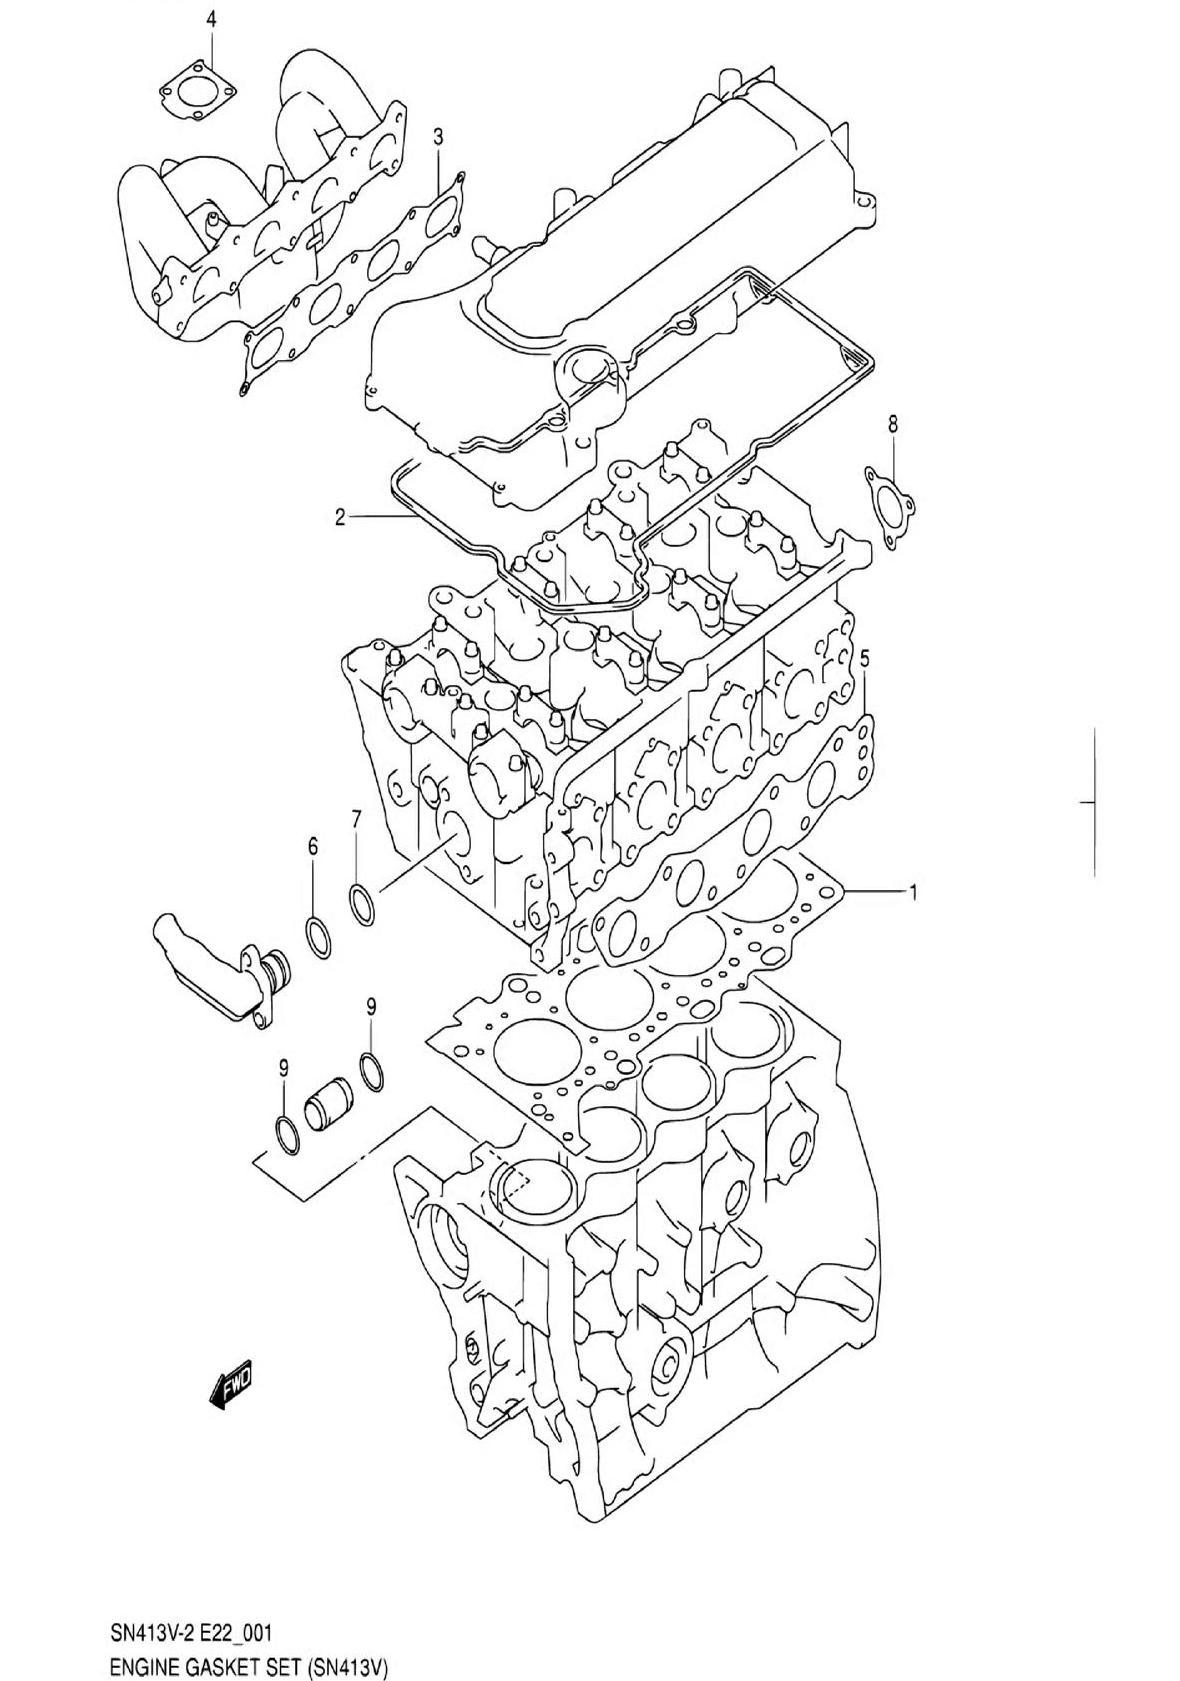 1 - Комплект прокладок двигателя (SN413V-2)